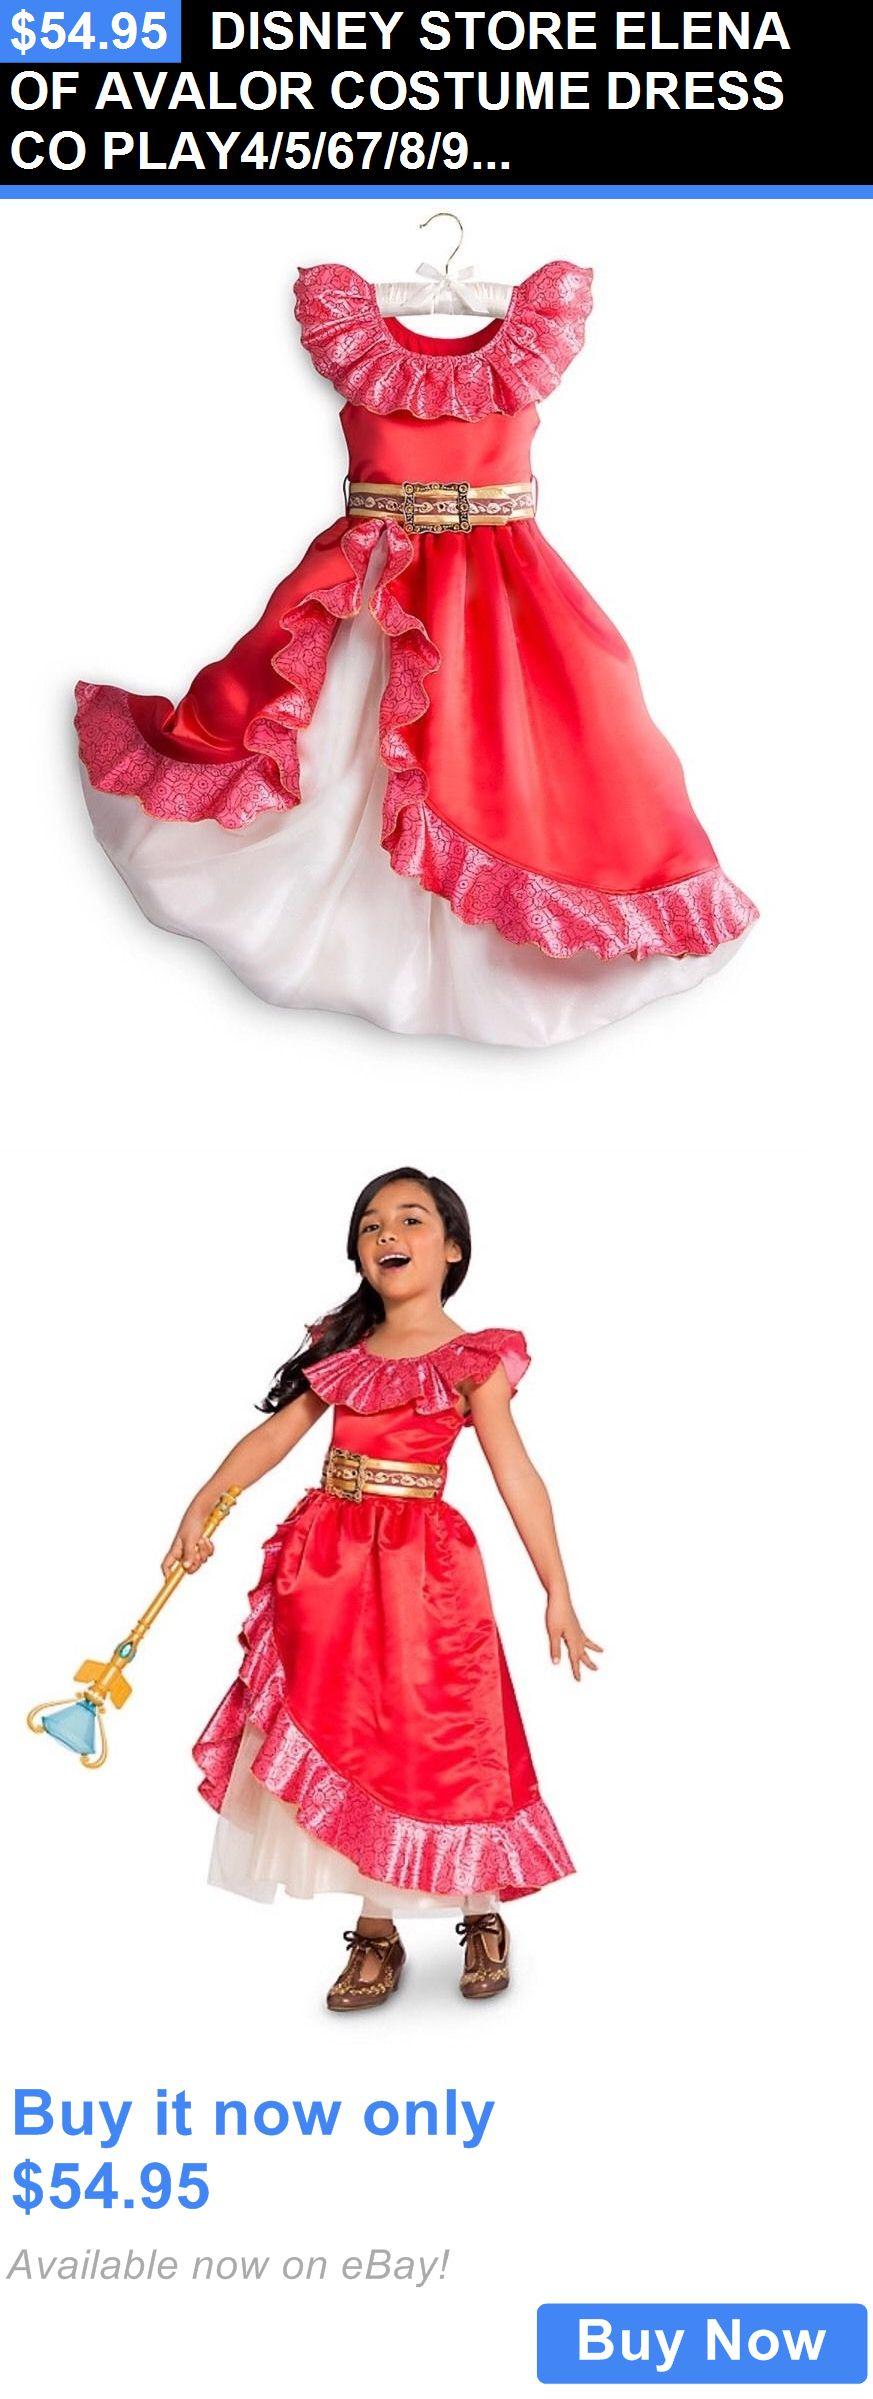 halloween costumes kids disney store elena of avalor costume dress co play45 - Kids Disney Halloween Costumes